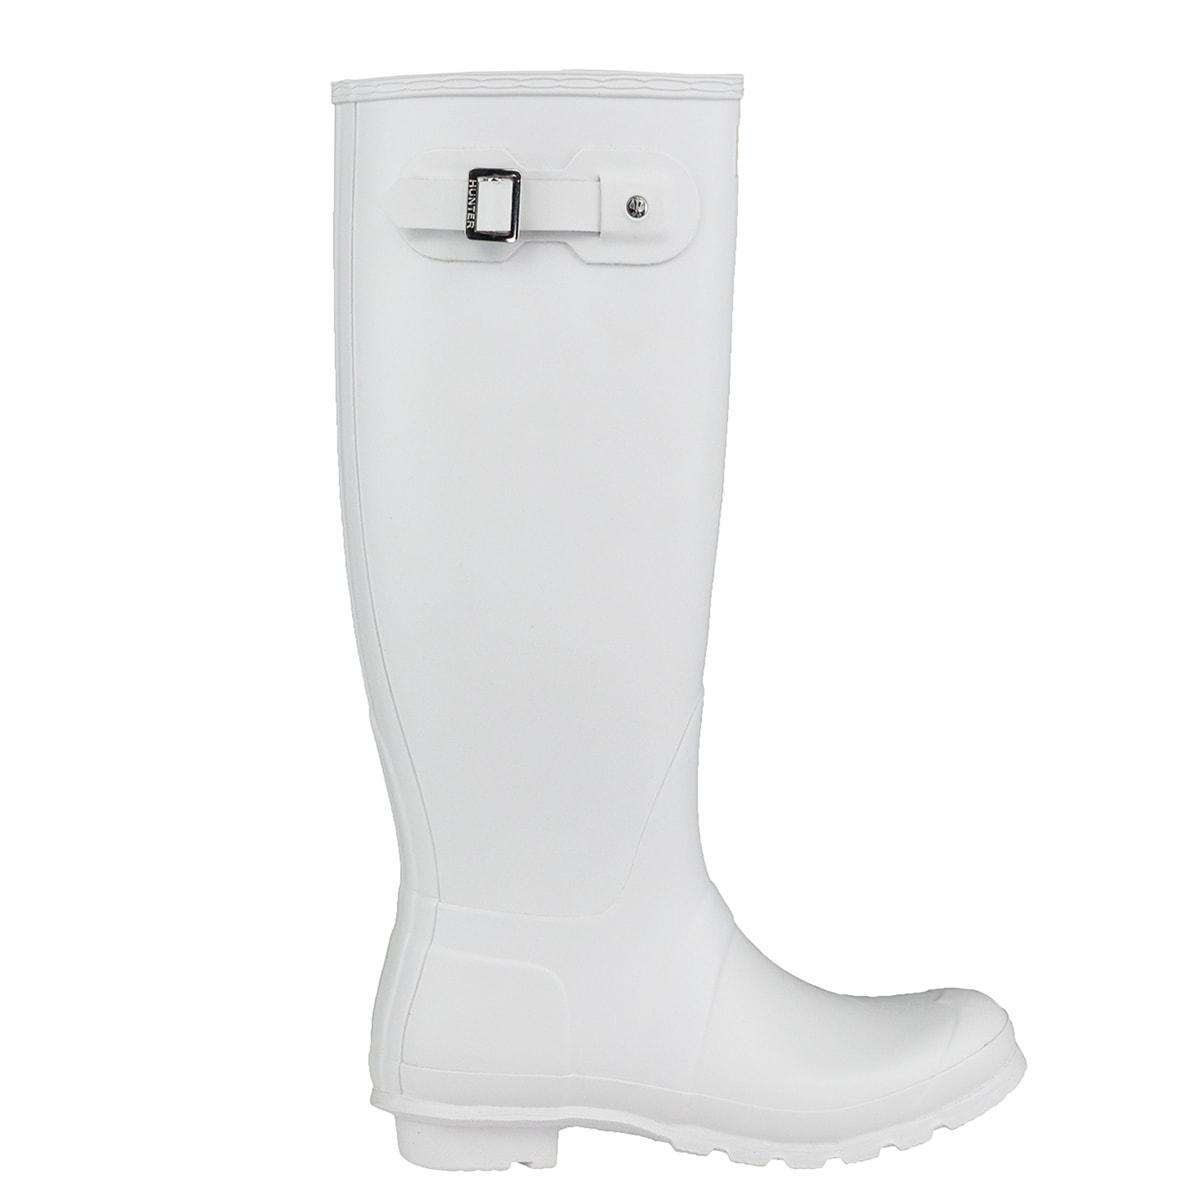 6003bdacc3a4 Hunter Women s Original Tall Rain Boots